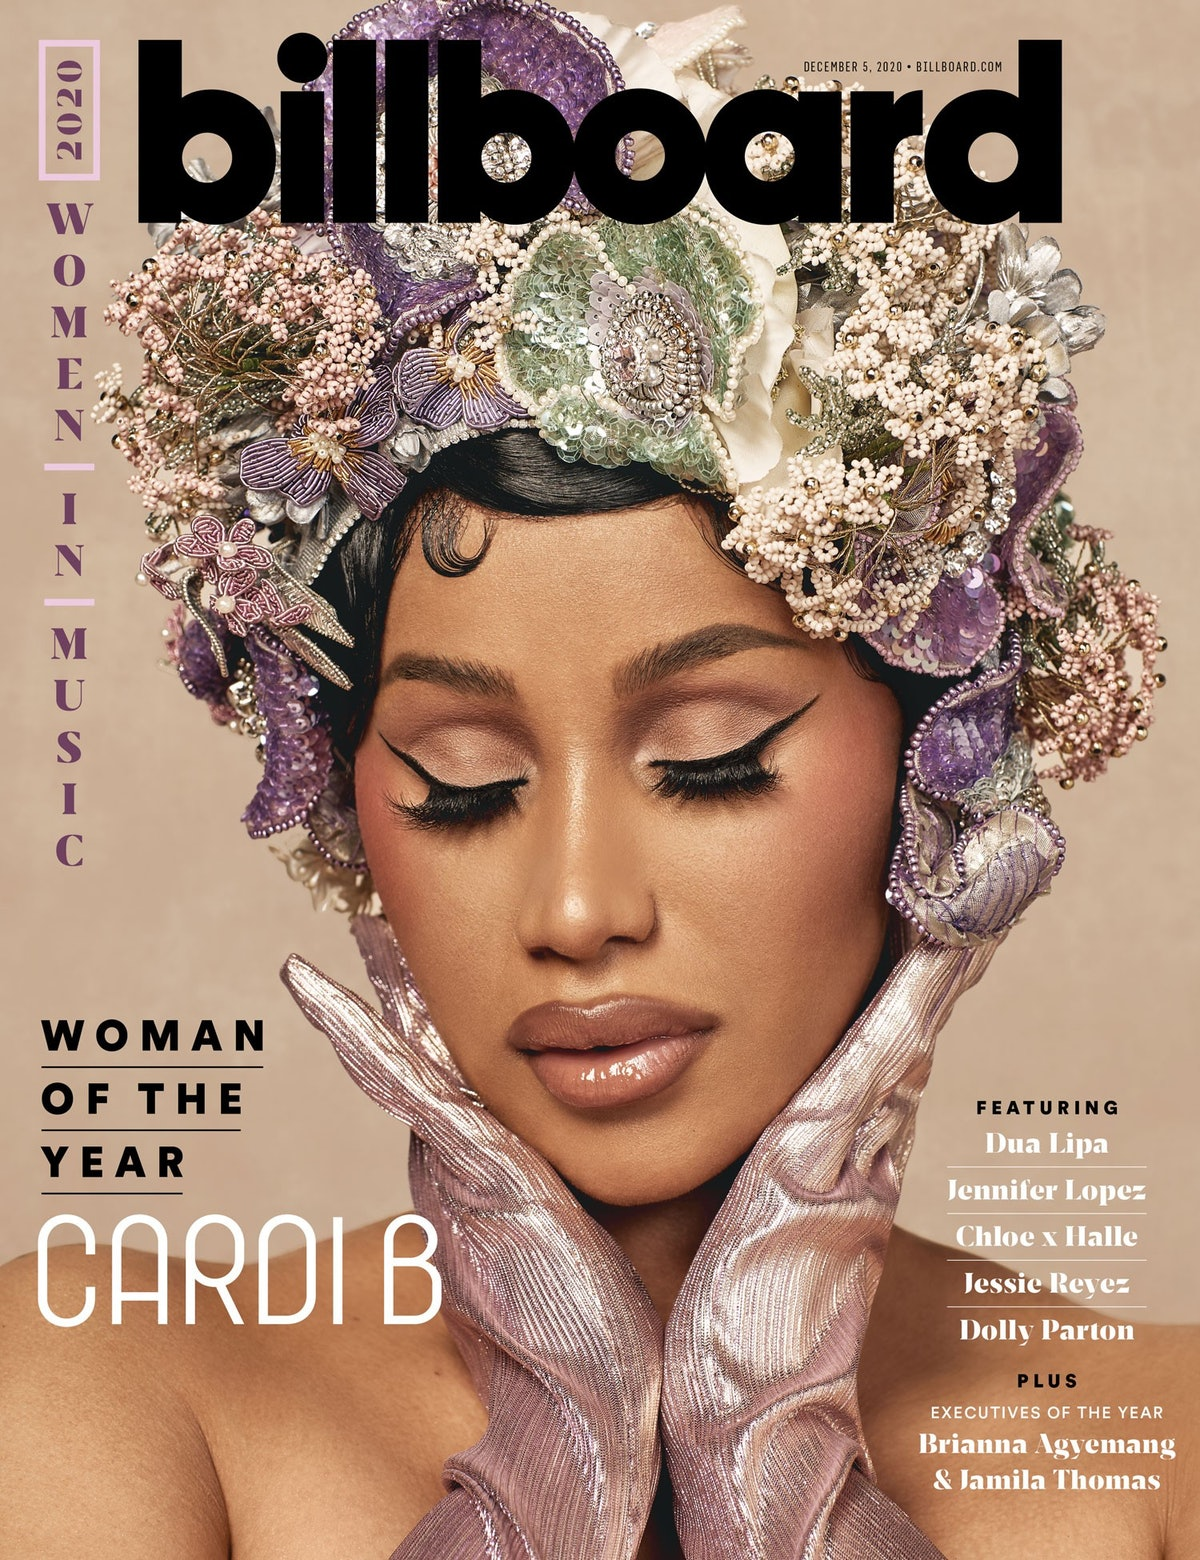 Cardi B graces Billboard's Women of the Year issue.